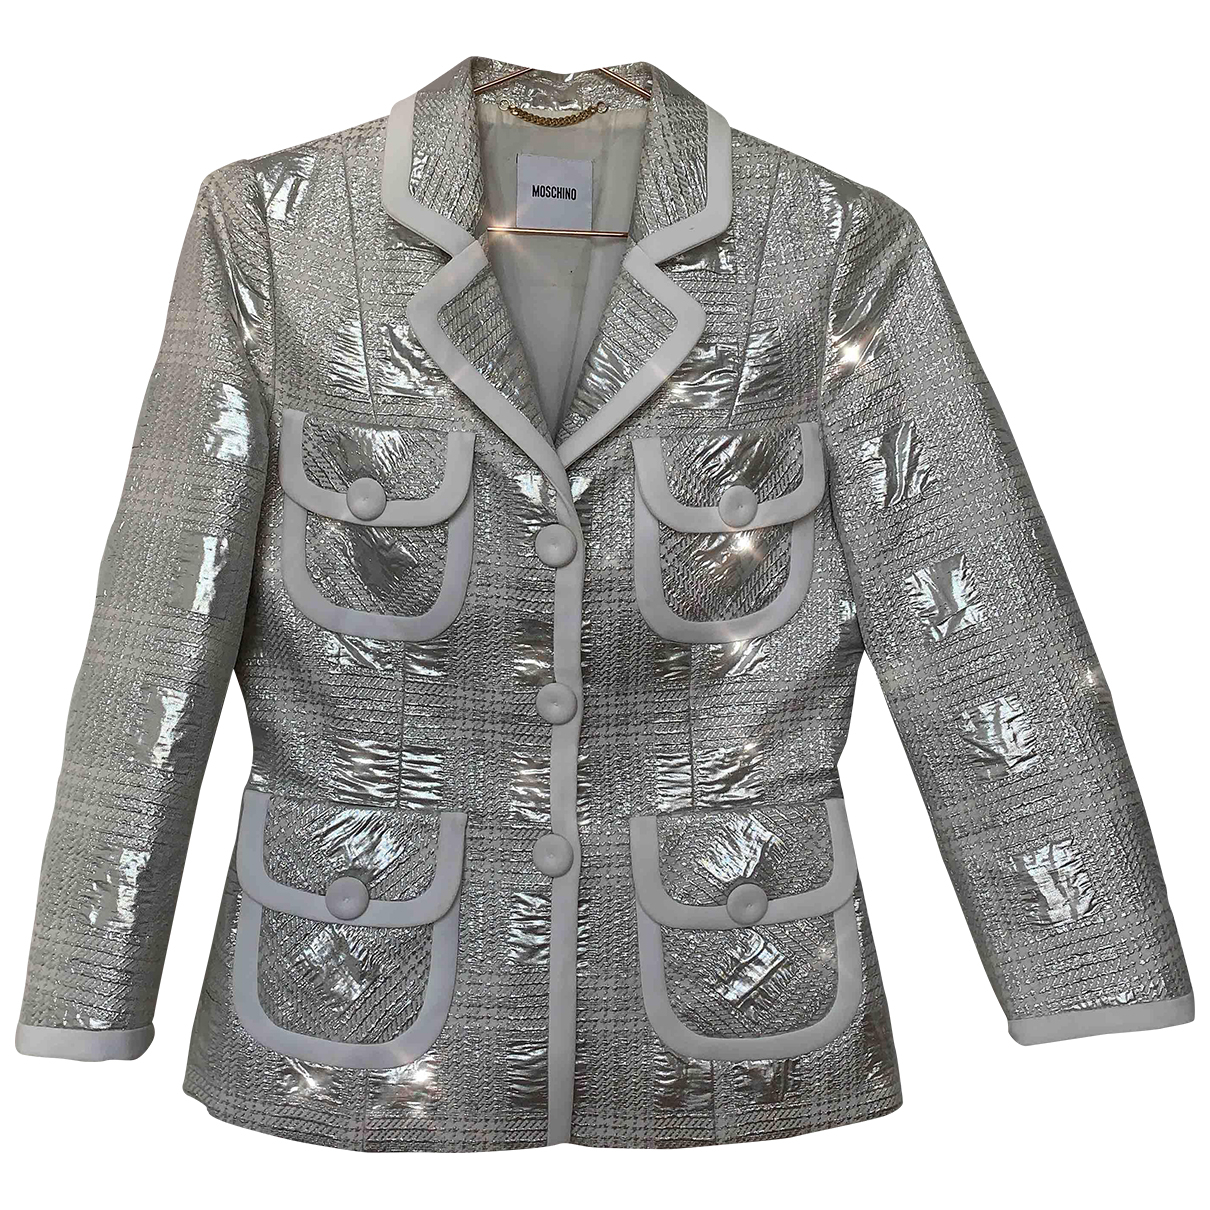 Moschino - Veste   pour femme - argente